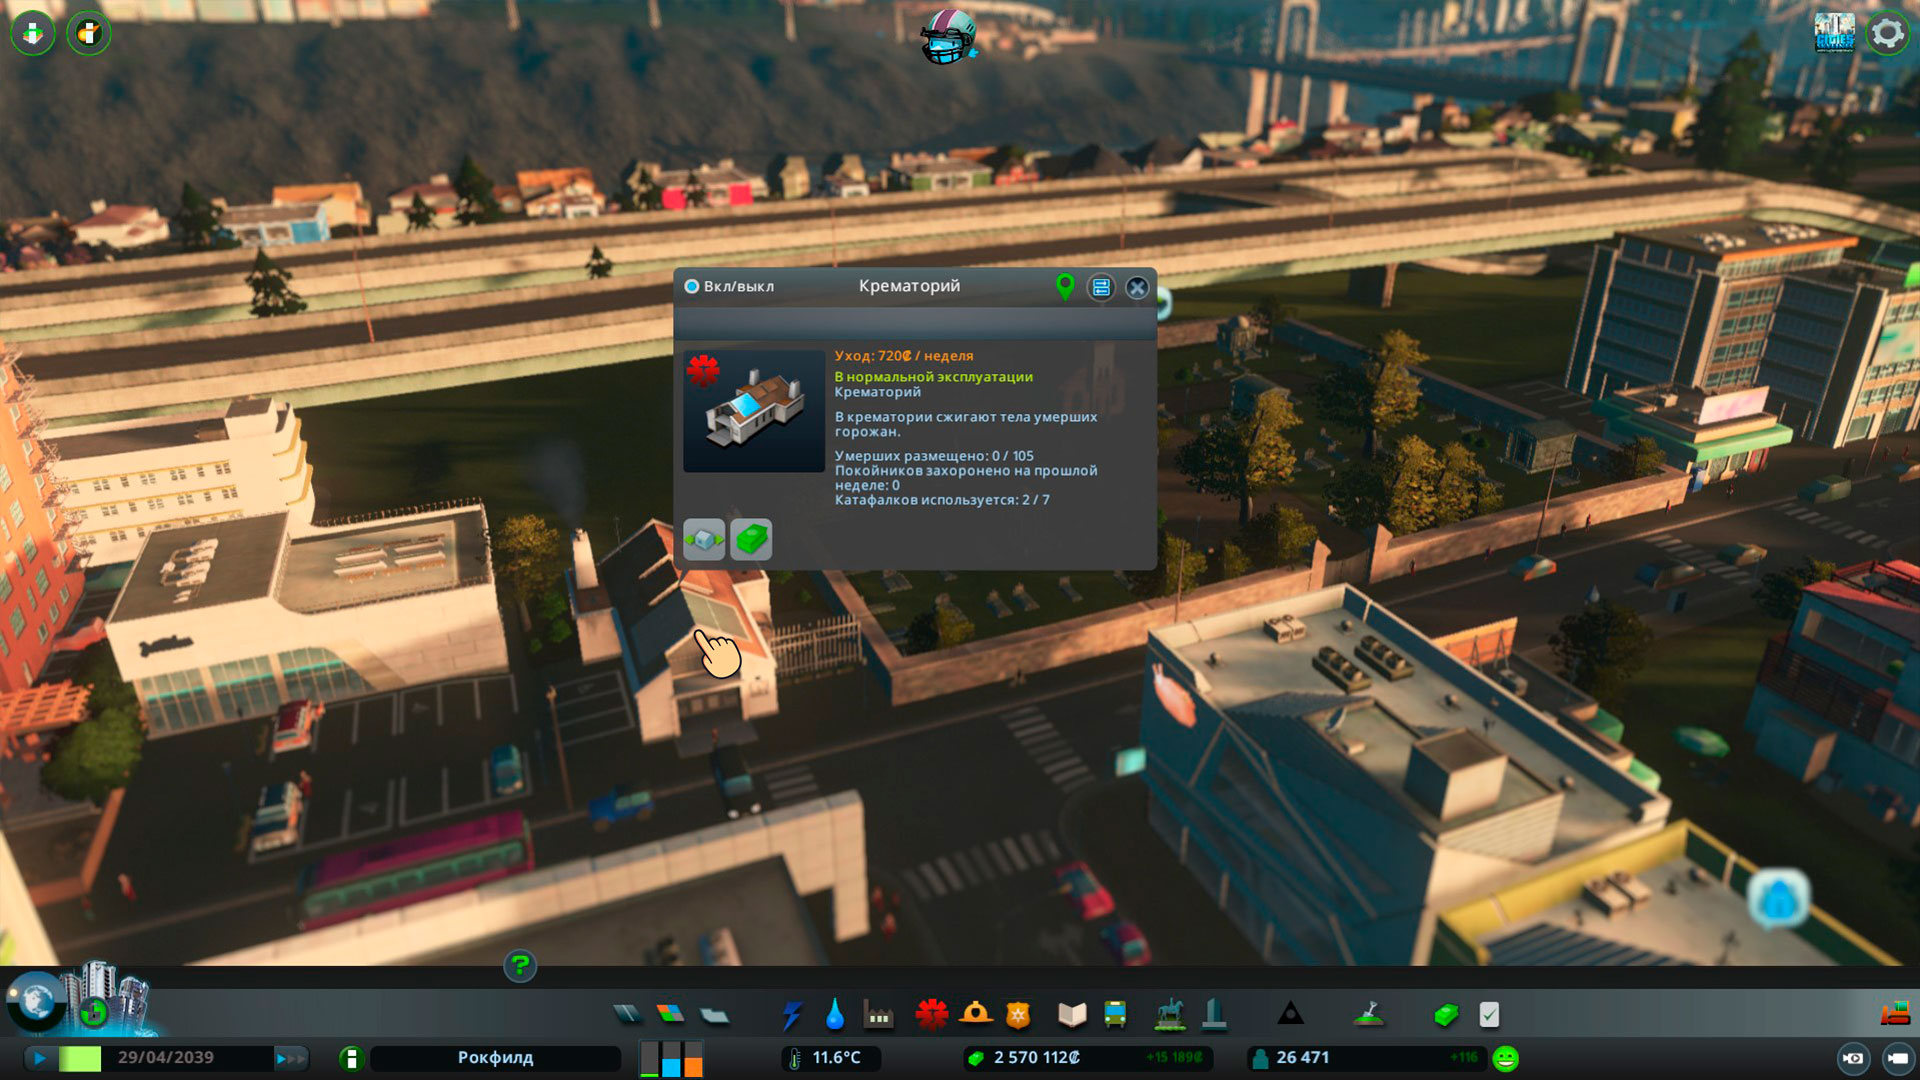 Крематории и криохранилище cities skylines